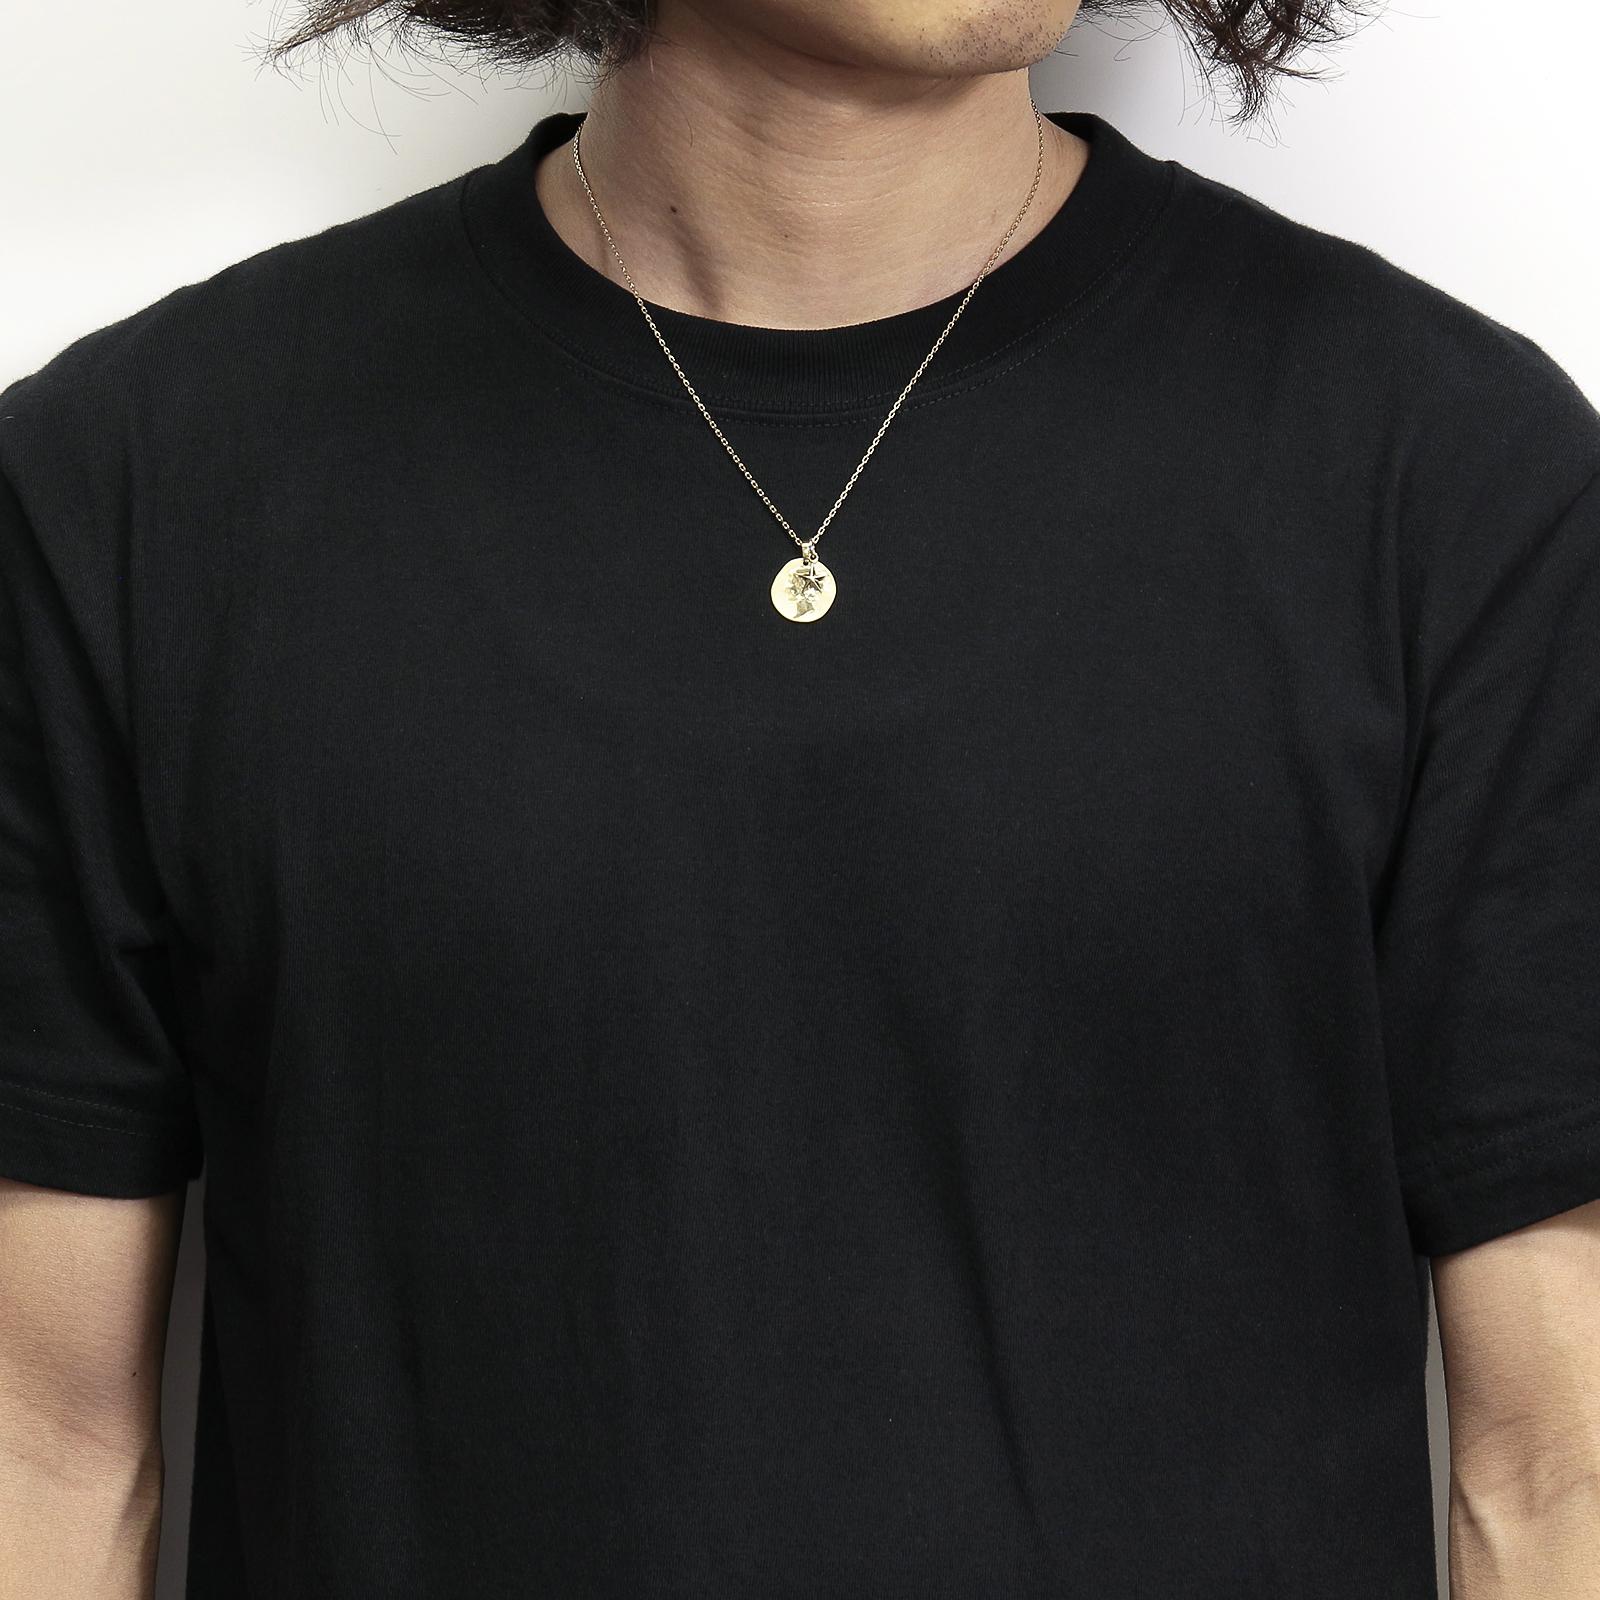 Liberty Head Pendant + Small Star Charm - K18Yellow Gold Set Necklace